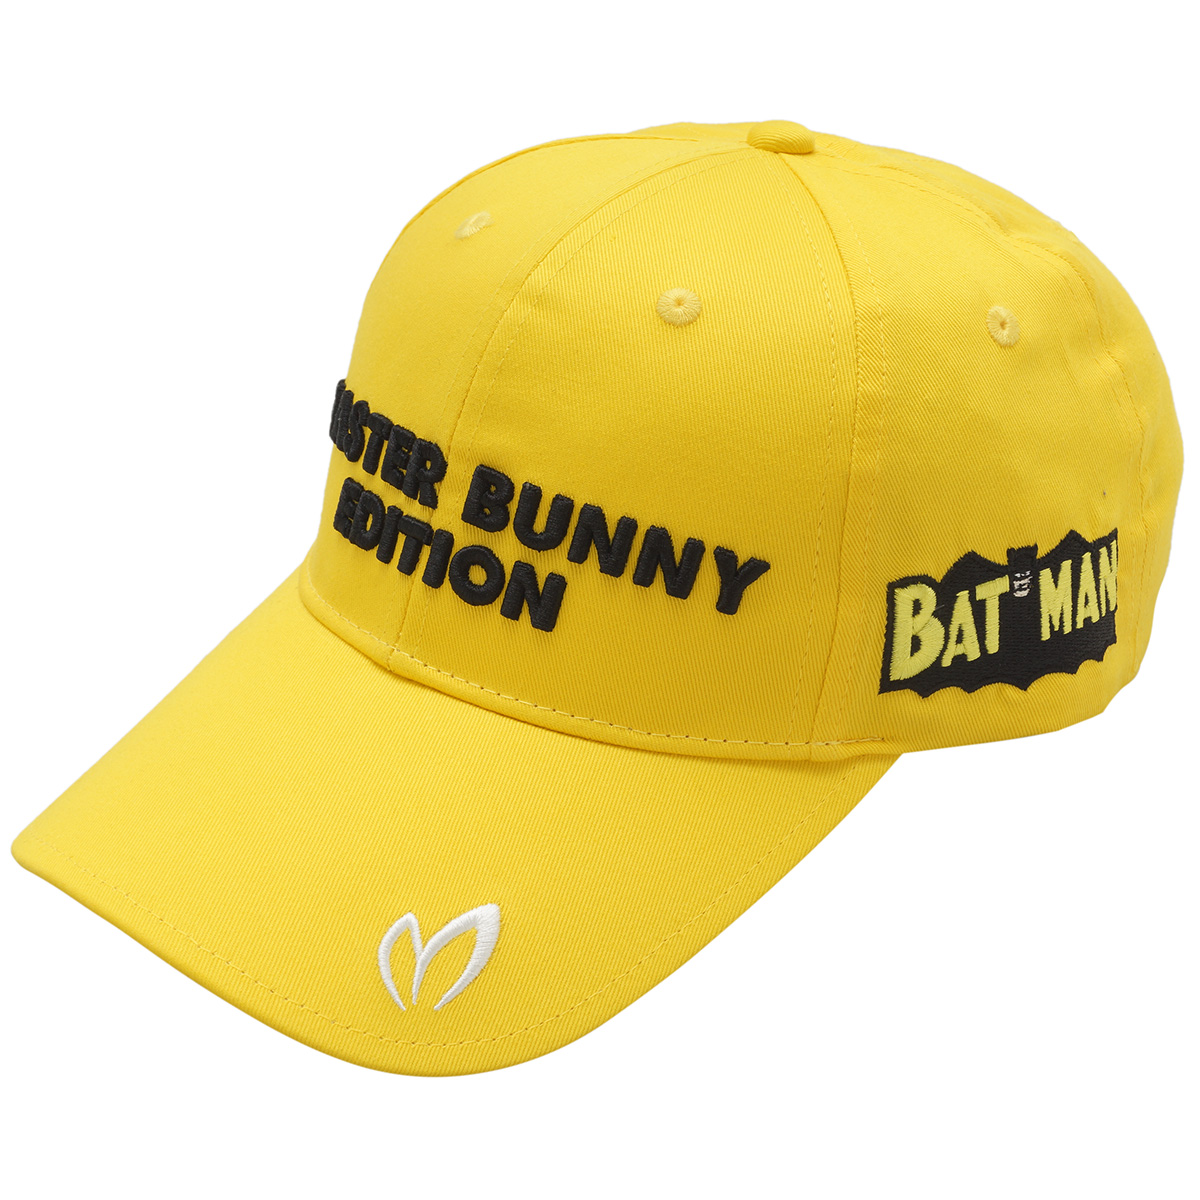 BATMAN ツイルキャップ